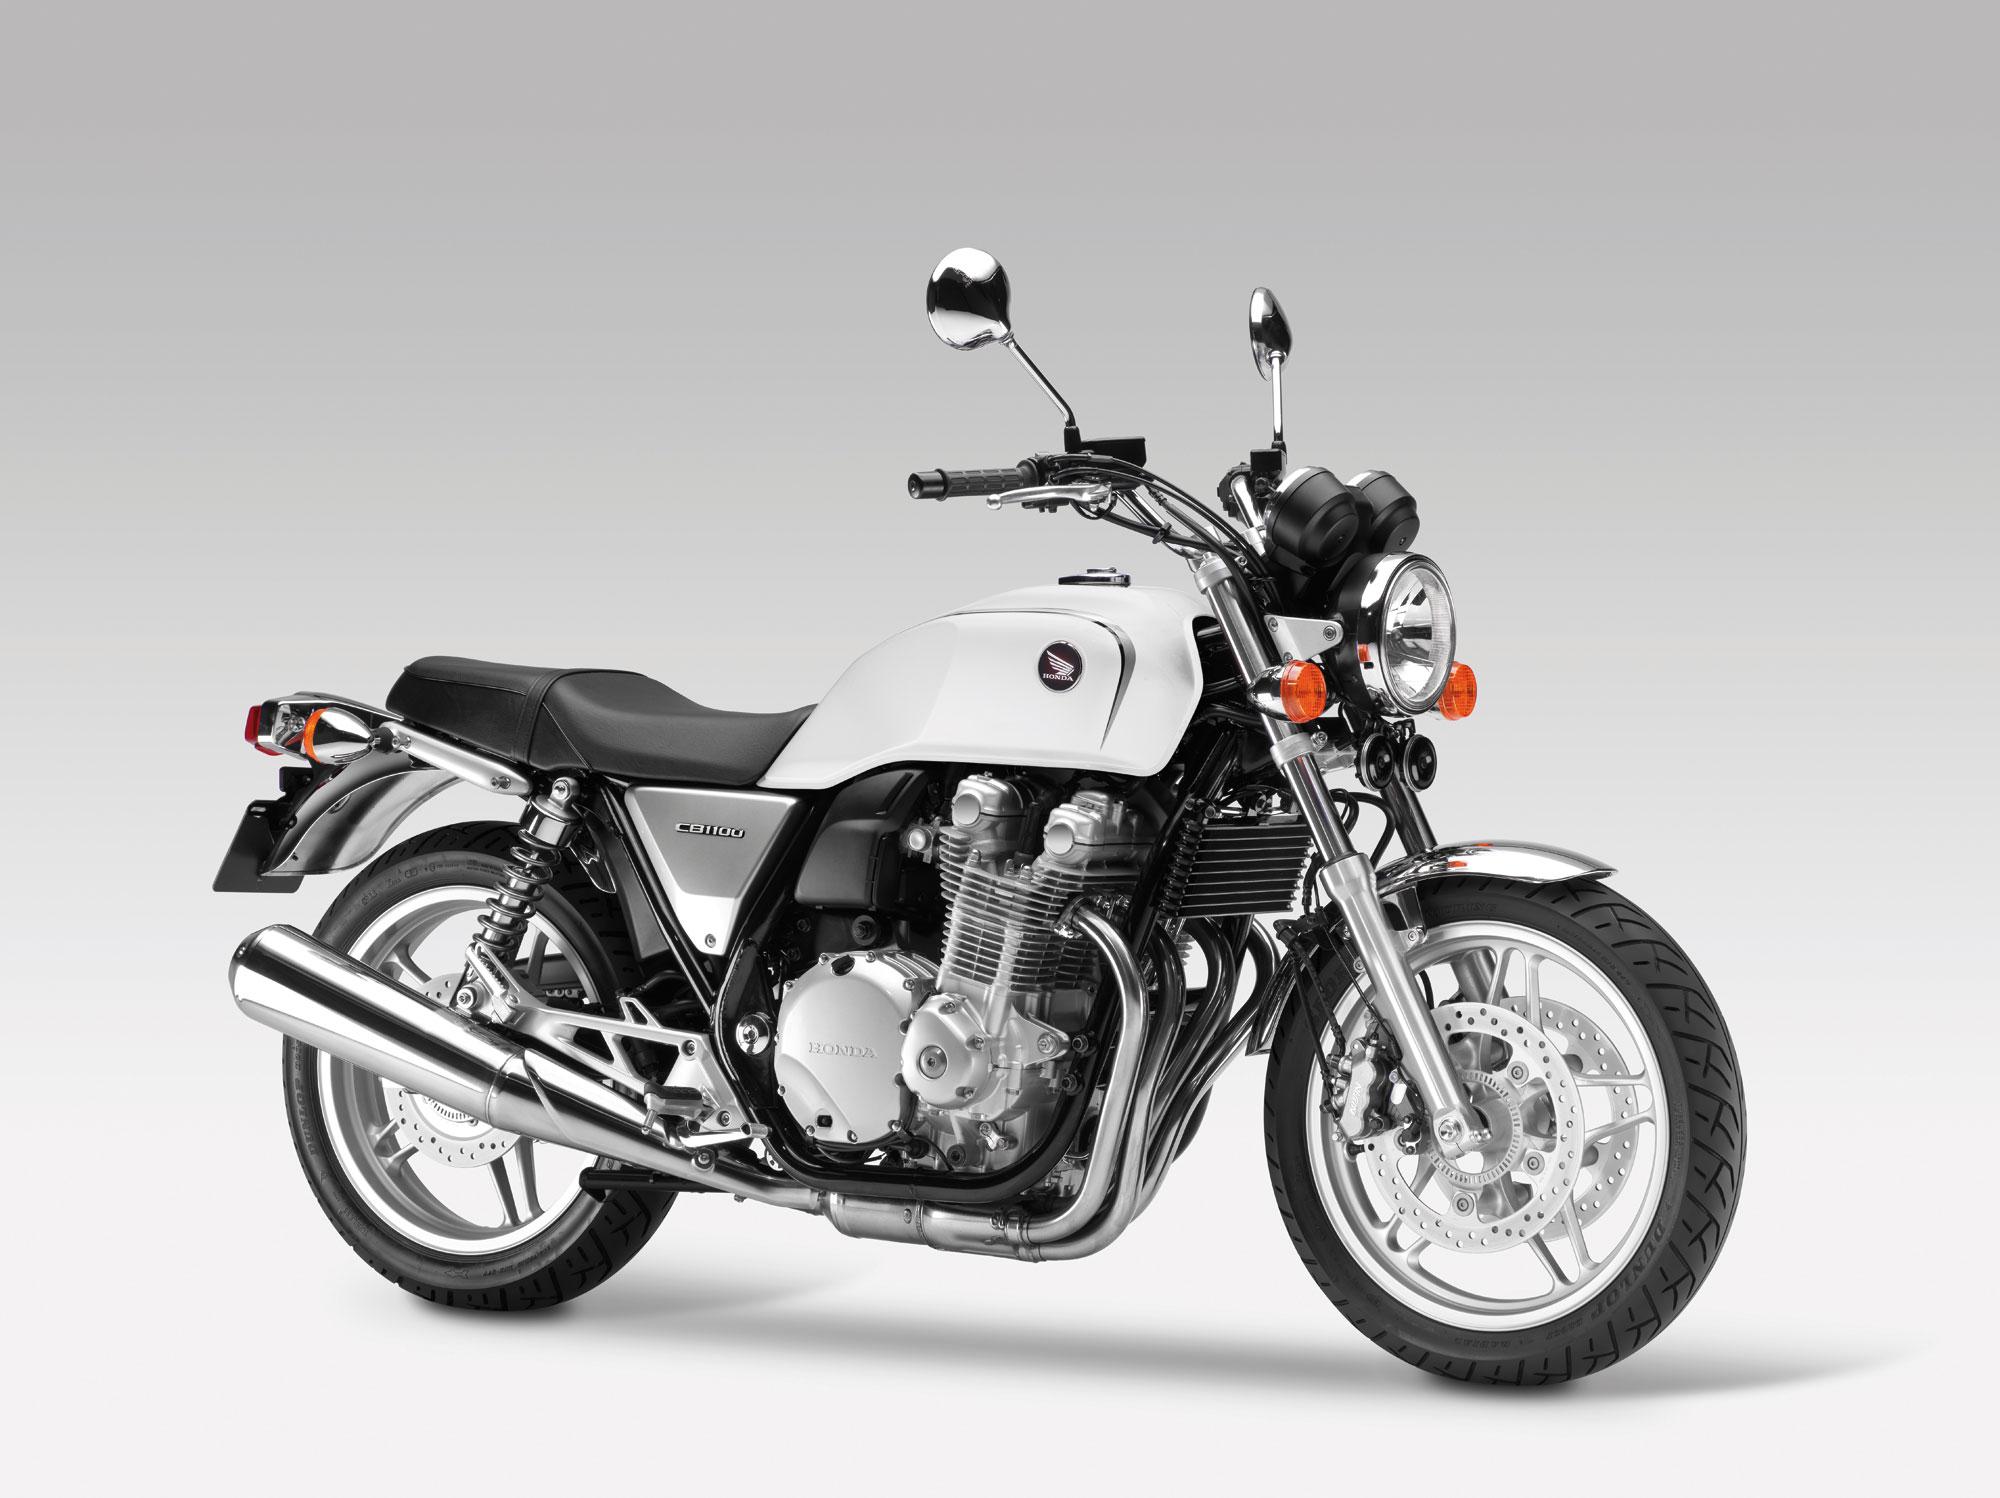 Honda Cb1100 2017 >> HONDA CB1100 specs - 2012, 2013 - autoevolution